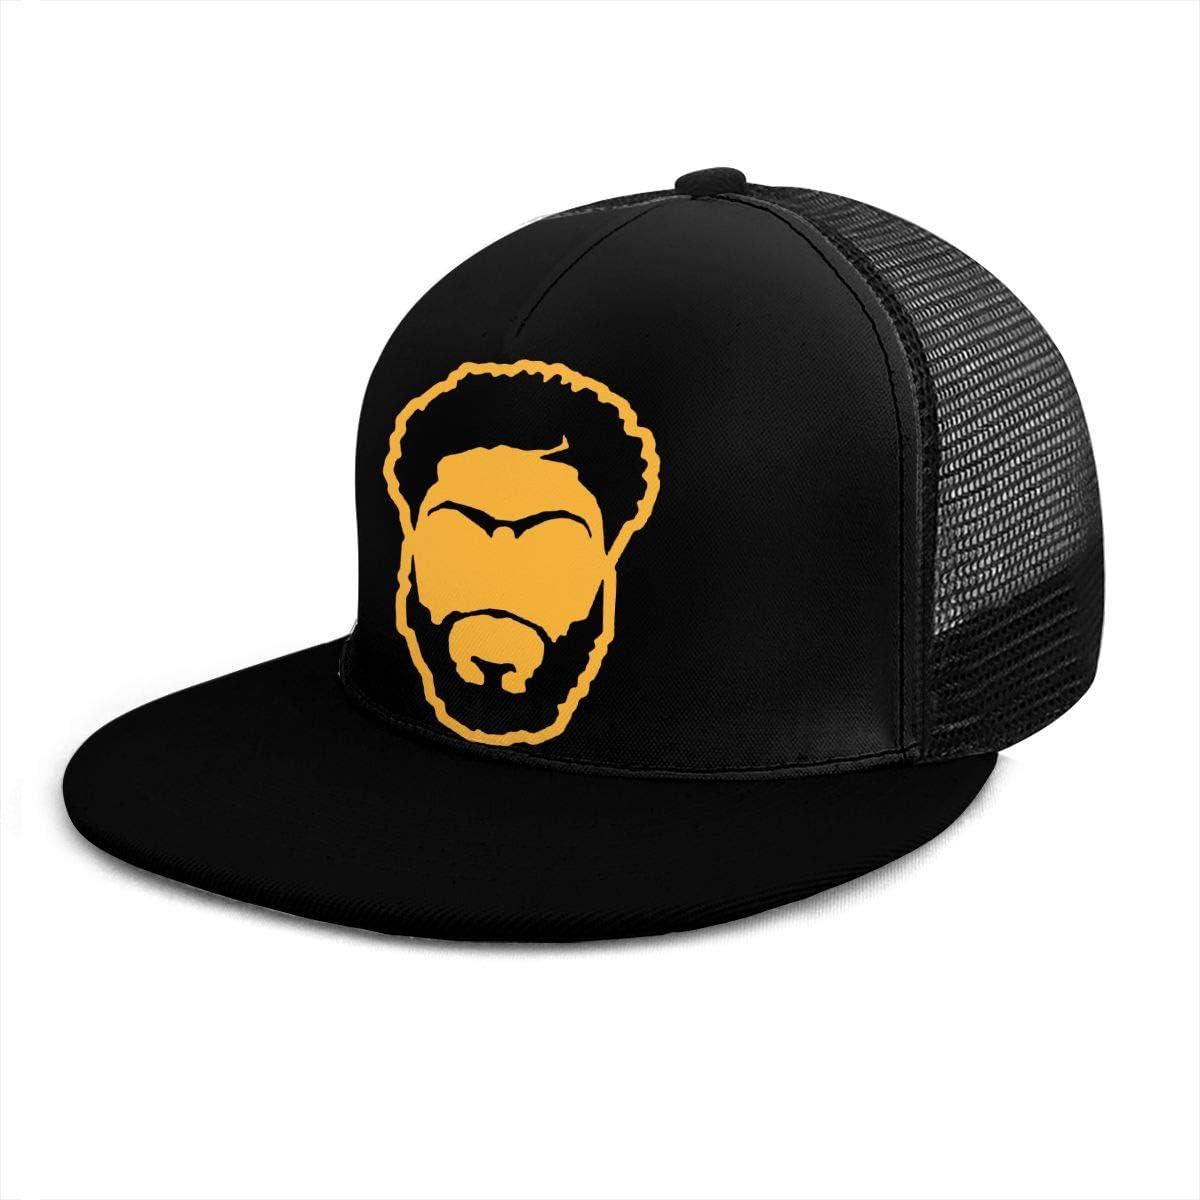 Casual Plain Los Angeles Davis Face Dad Hats Unisex Adjustable Baseball Cap Black